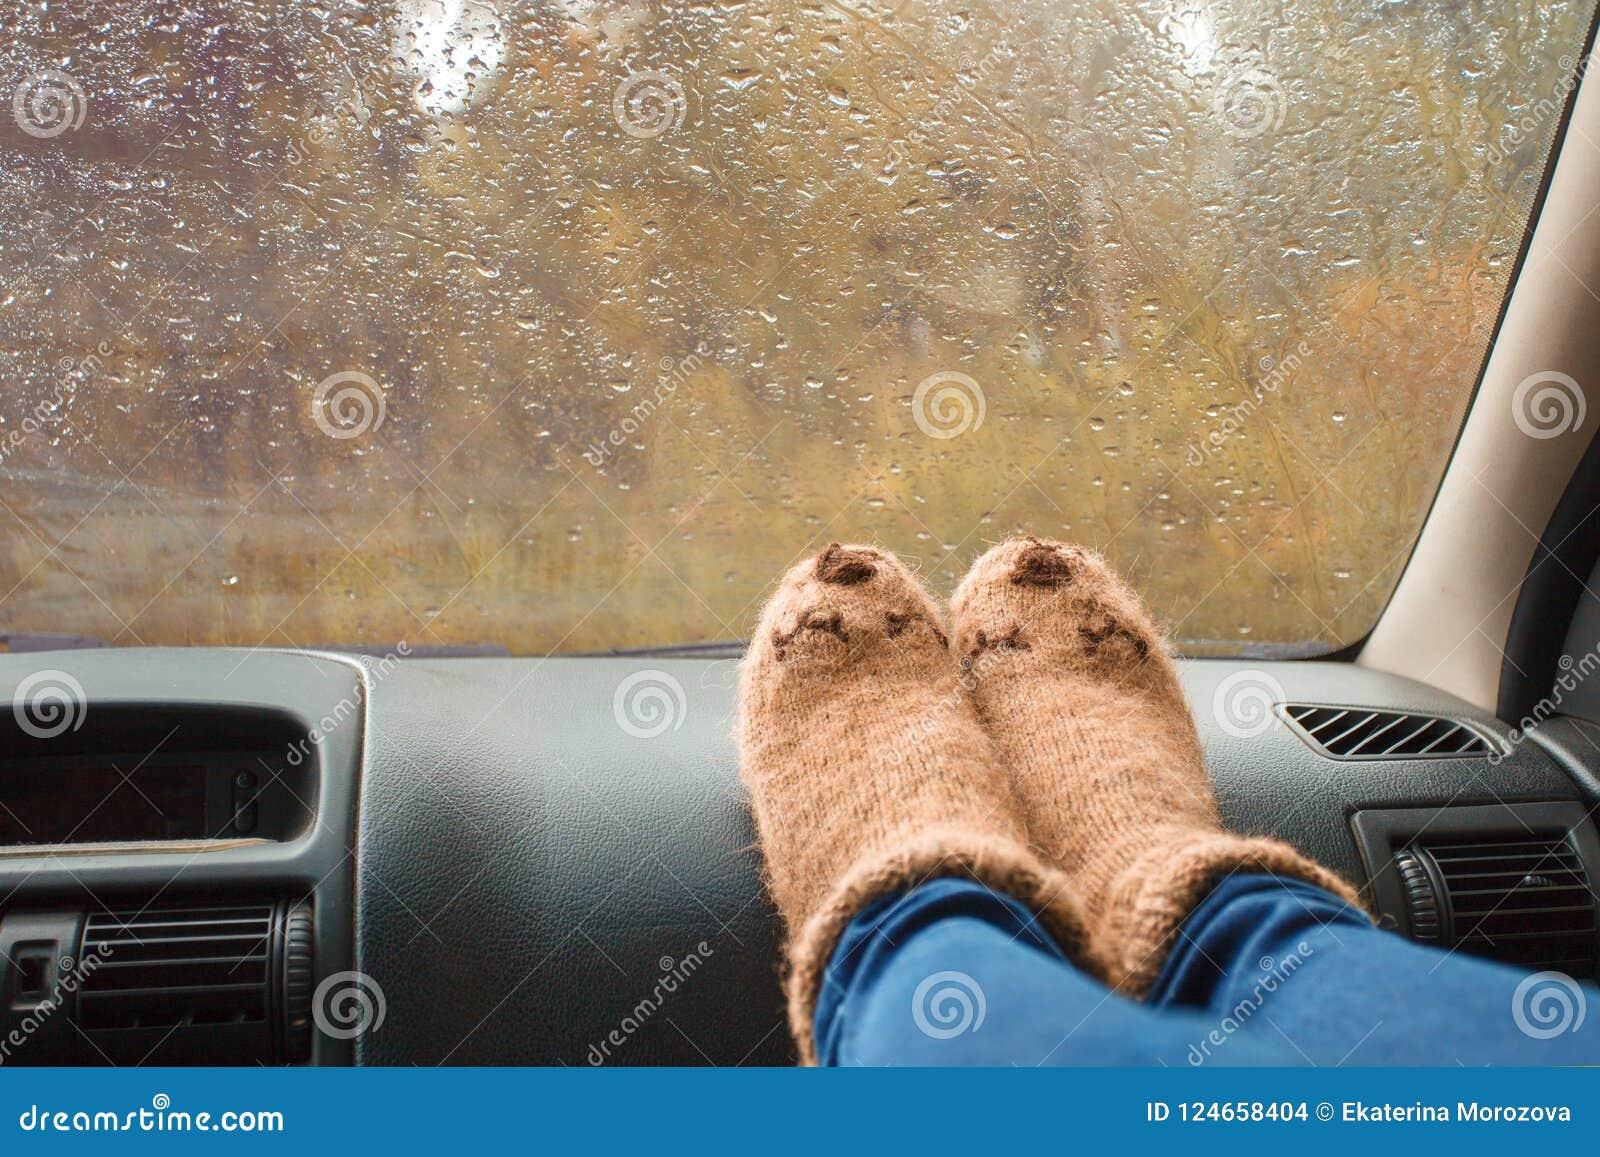 Woman legs in warm cute socks on car dashboard. Drinking warm tee on the way. Fall trip. Rain drops on windshield. Freedom travel